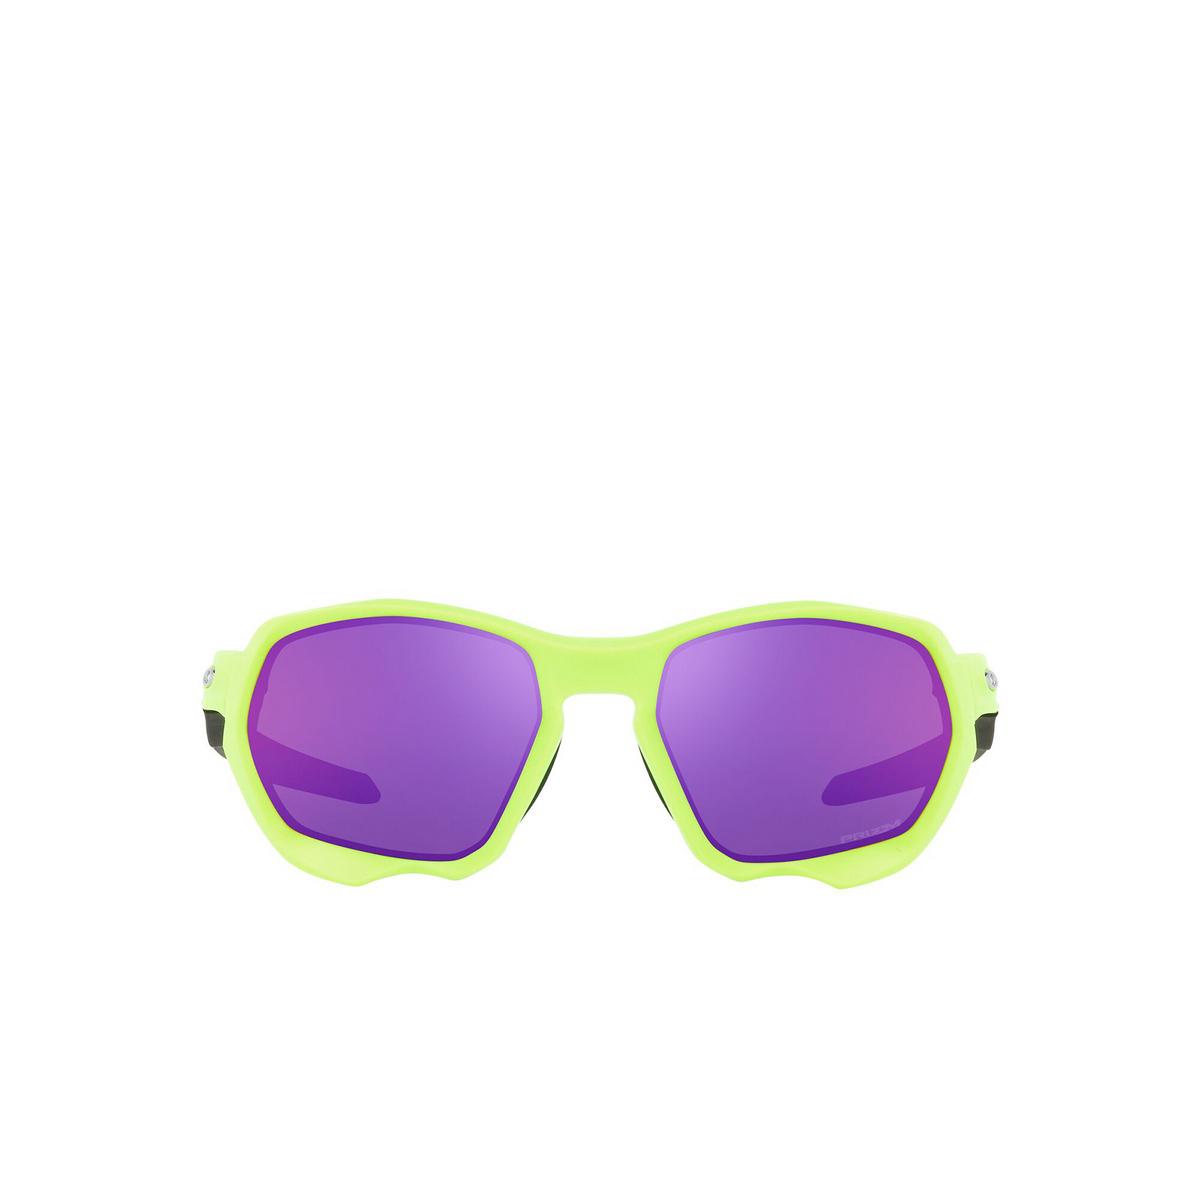 Oakley® Sport Sunglasses: Plazma OO9019 color Matte Retina Burn 901904 - front view.